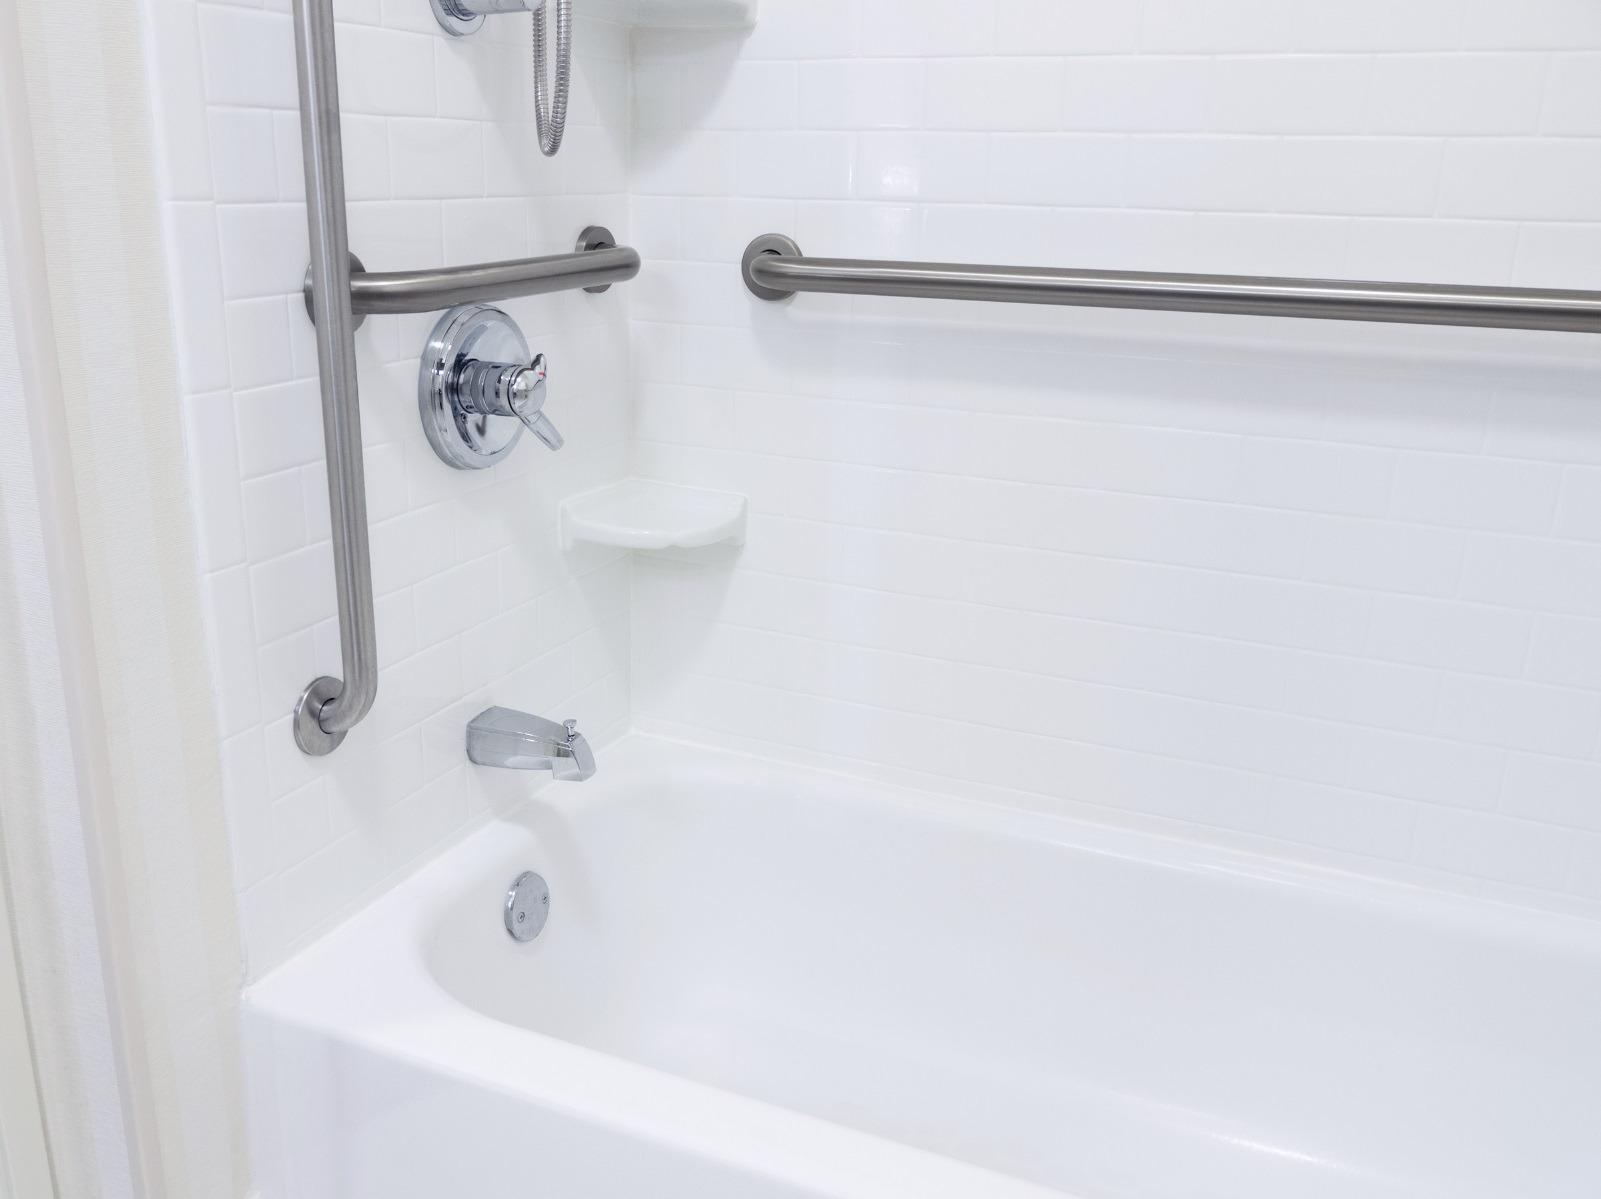 How to make your bathroom ada compliant american bath - Ada commercial bathroom requirements 2017 ...